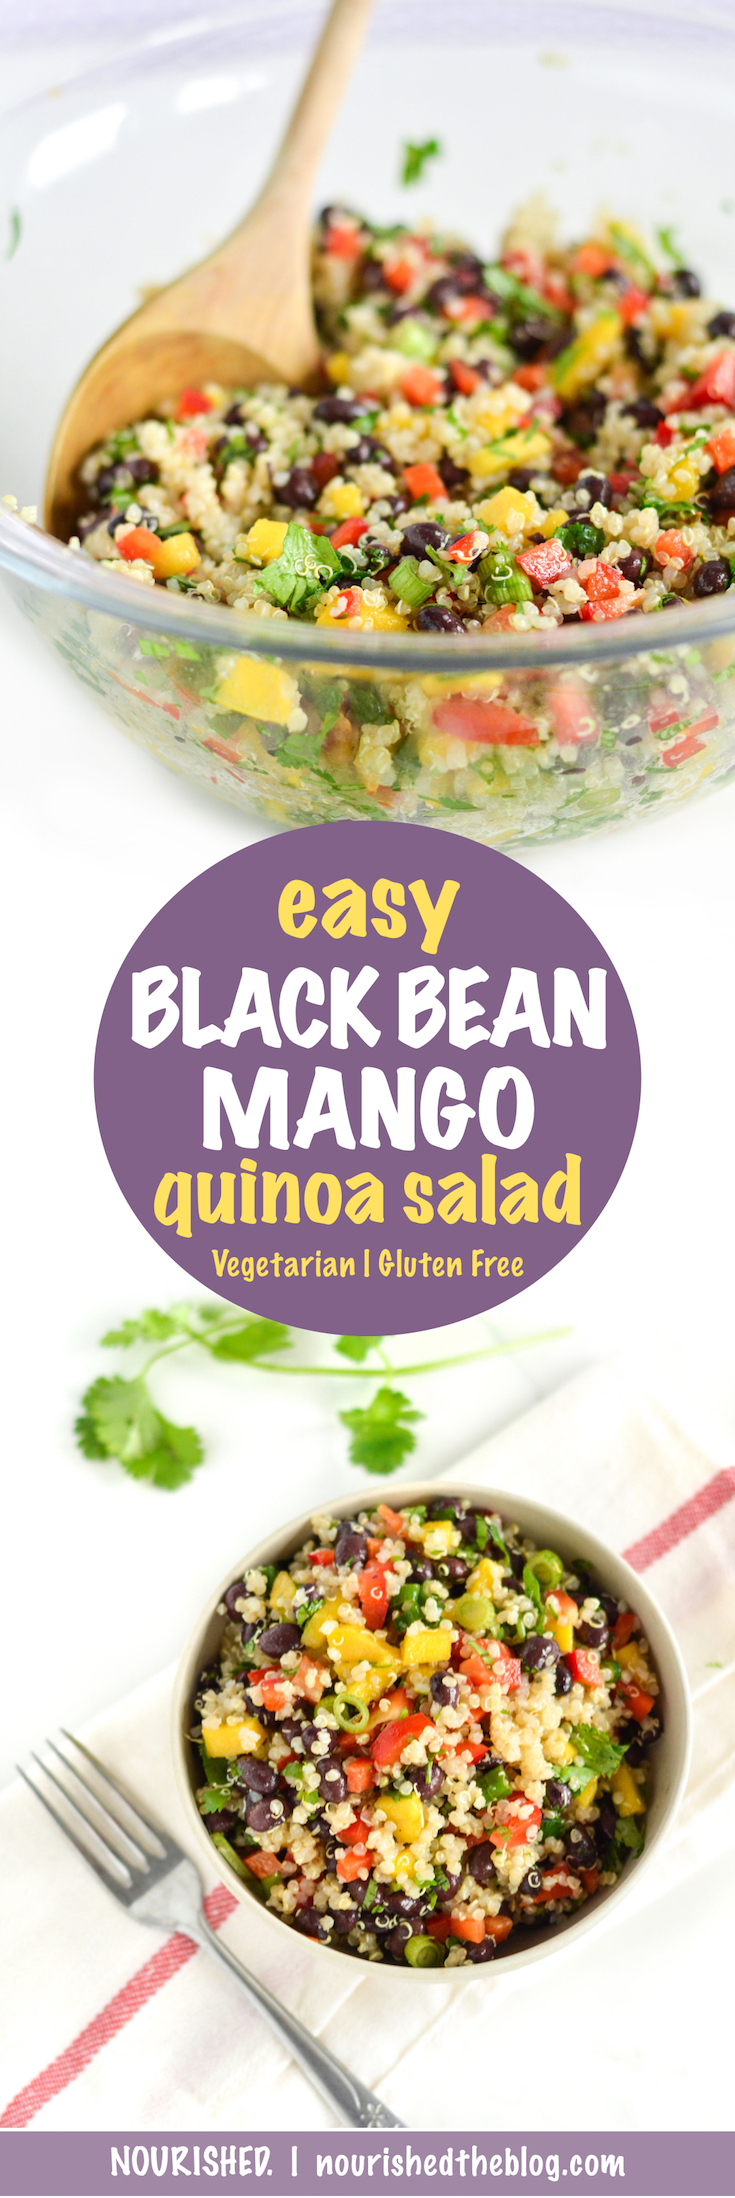 Easy Black Bean Mango Quinoa Salad   recipe   gluten free, vegan   quinoa salad with zesty lime dressing   easy quinoa recipe  